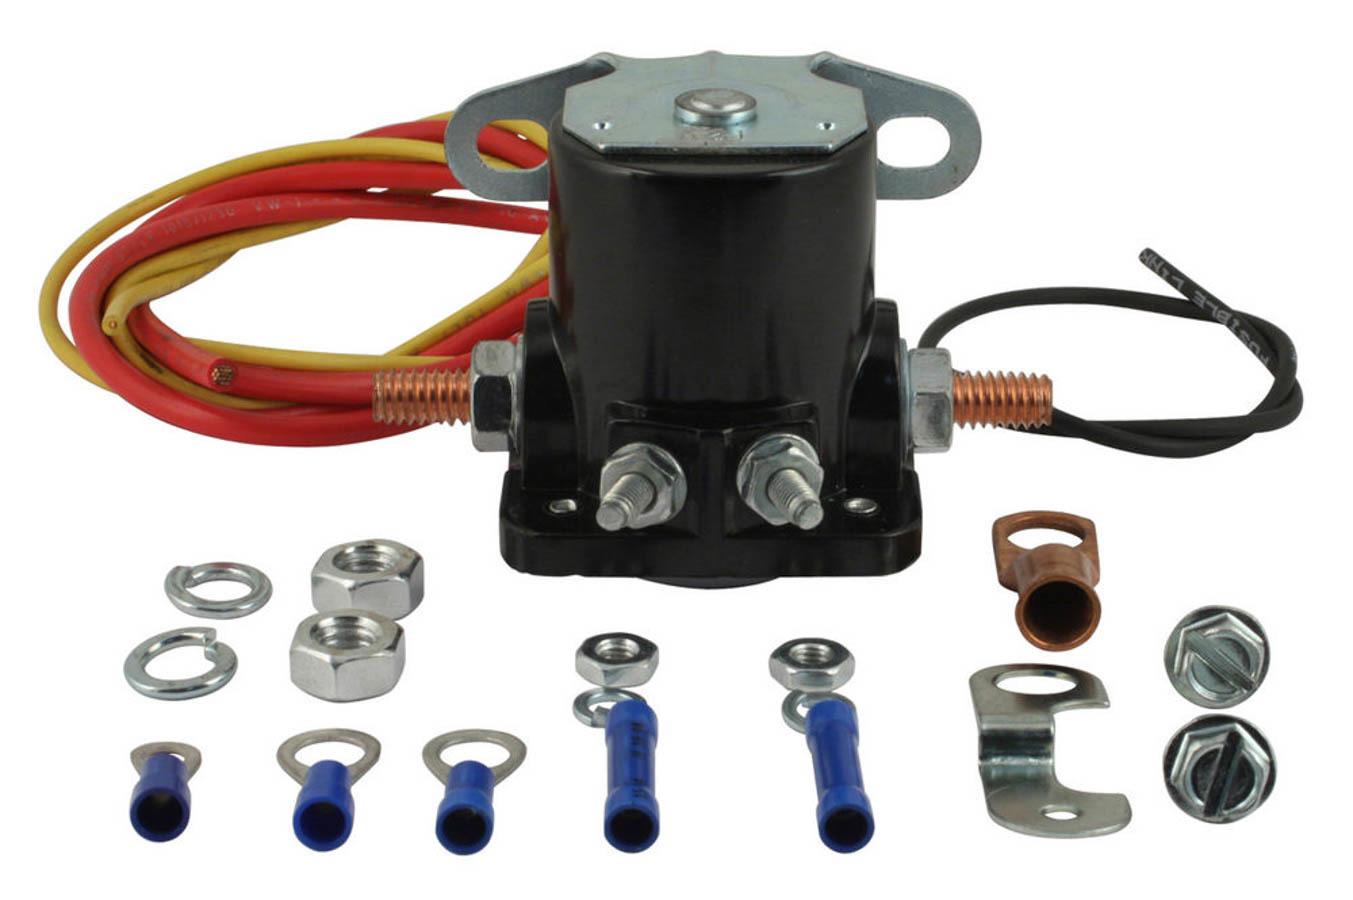 Tuff-Stuff 7629 Starter Solenoid, Hot Start, Remote, Terminals / Wiring Included, Black, GM Fullsize Starters, Kit